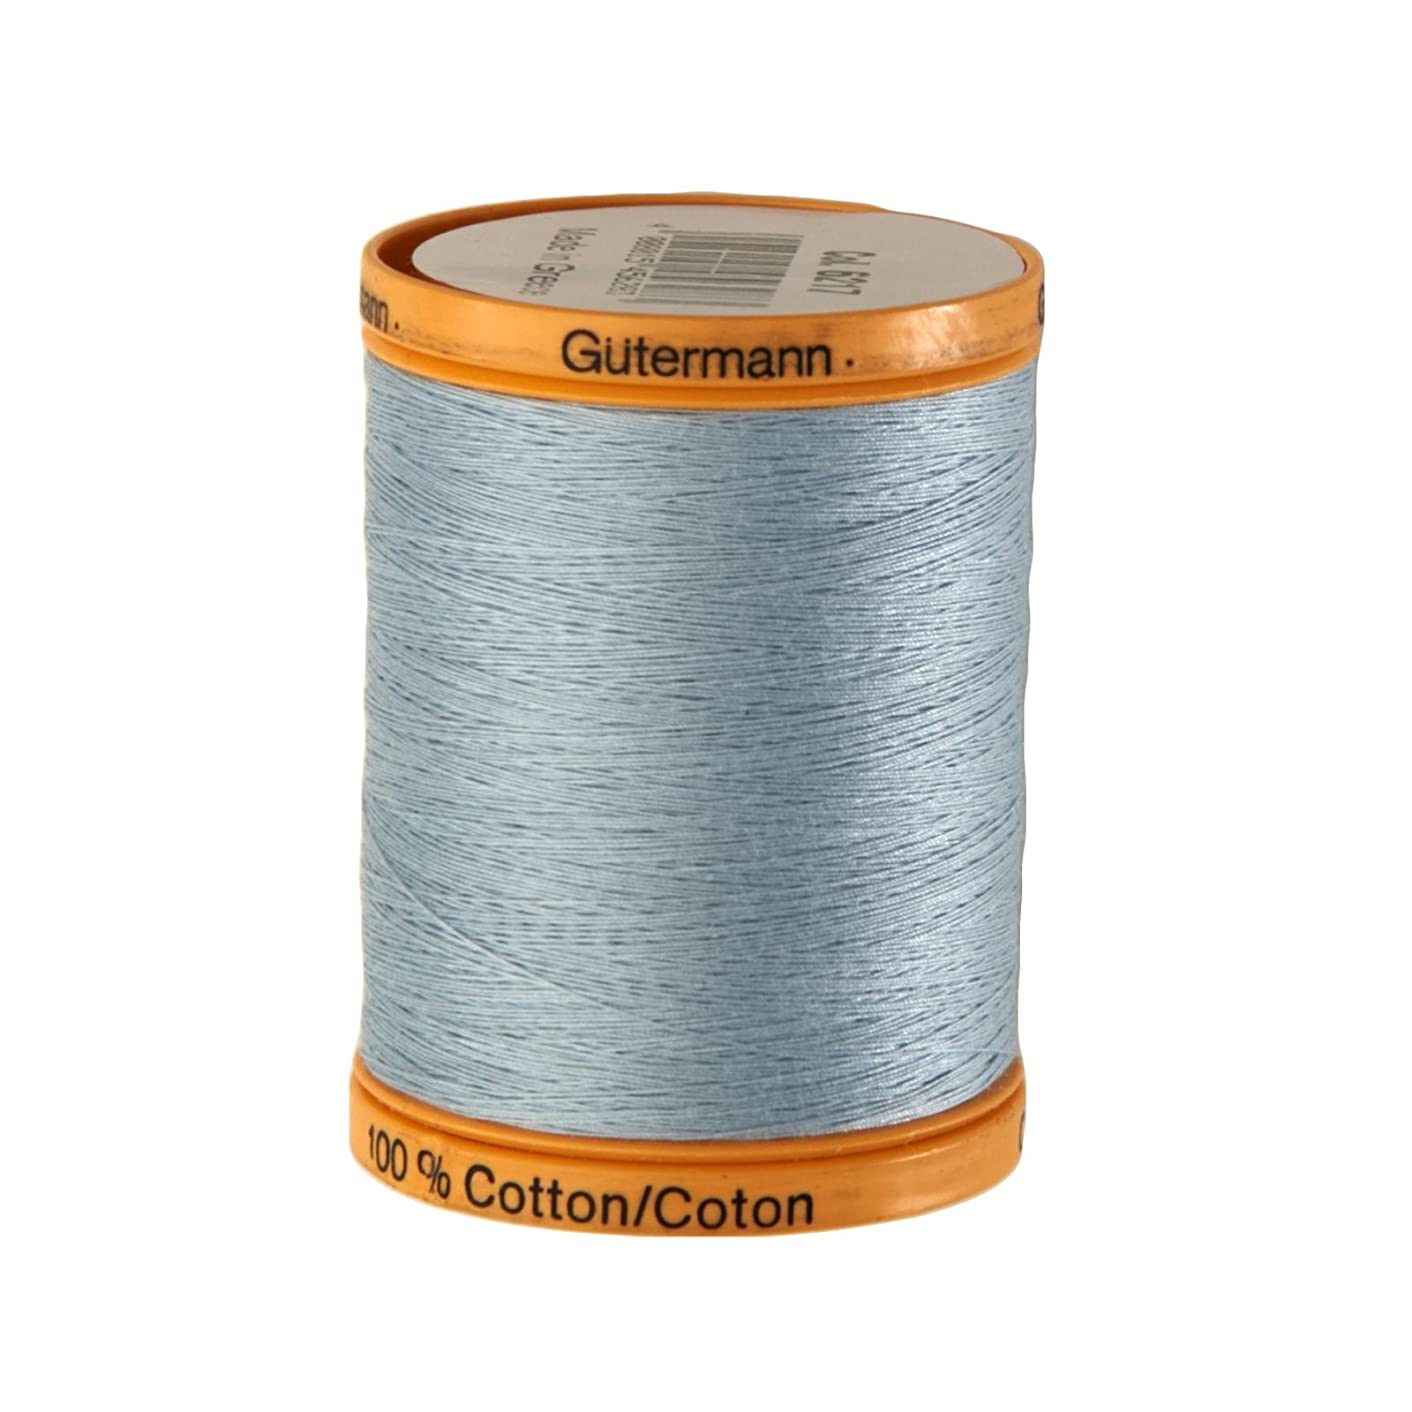 Gutermann Natural Cotton Thread, 800m/875 yd, Light Blue